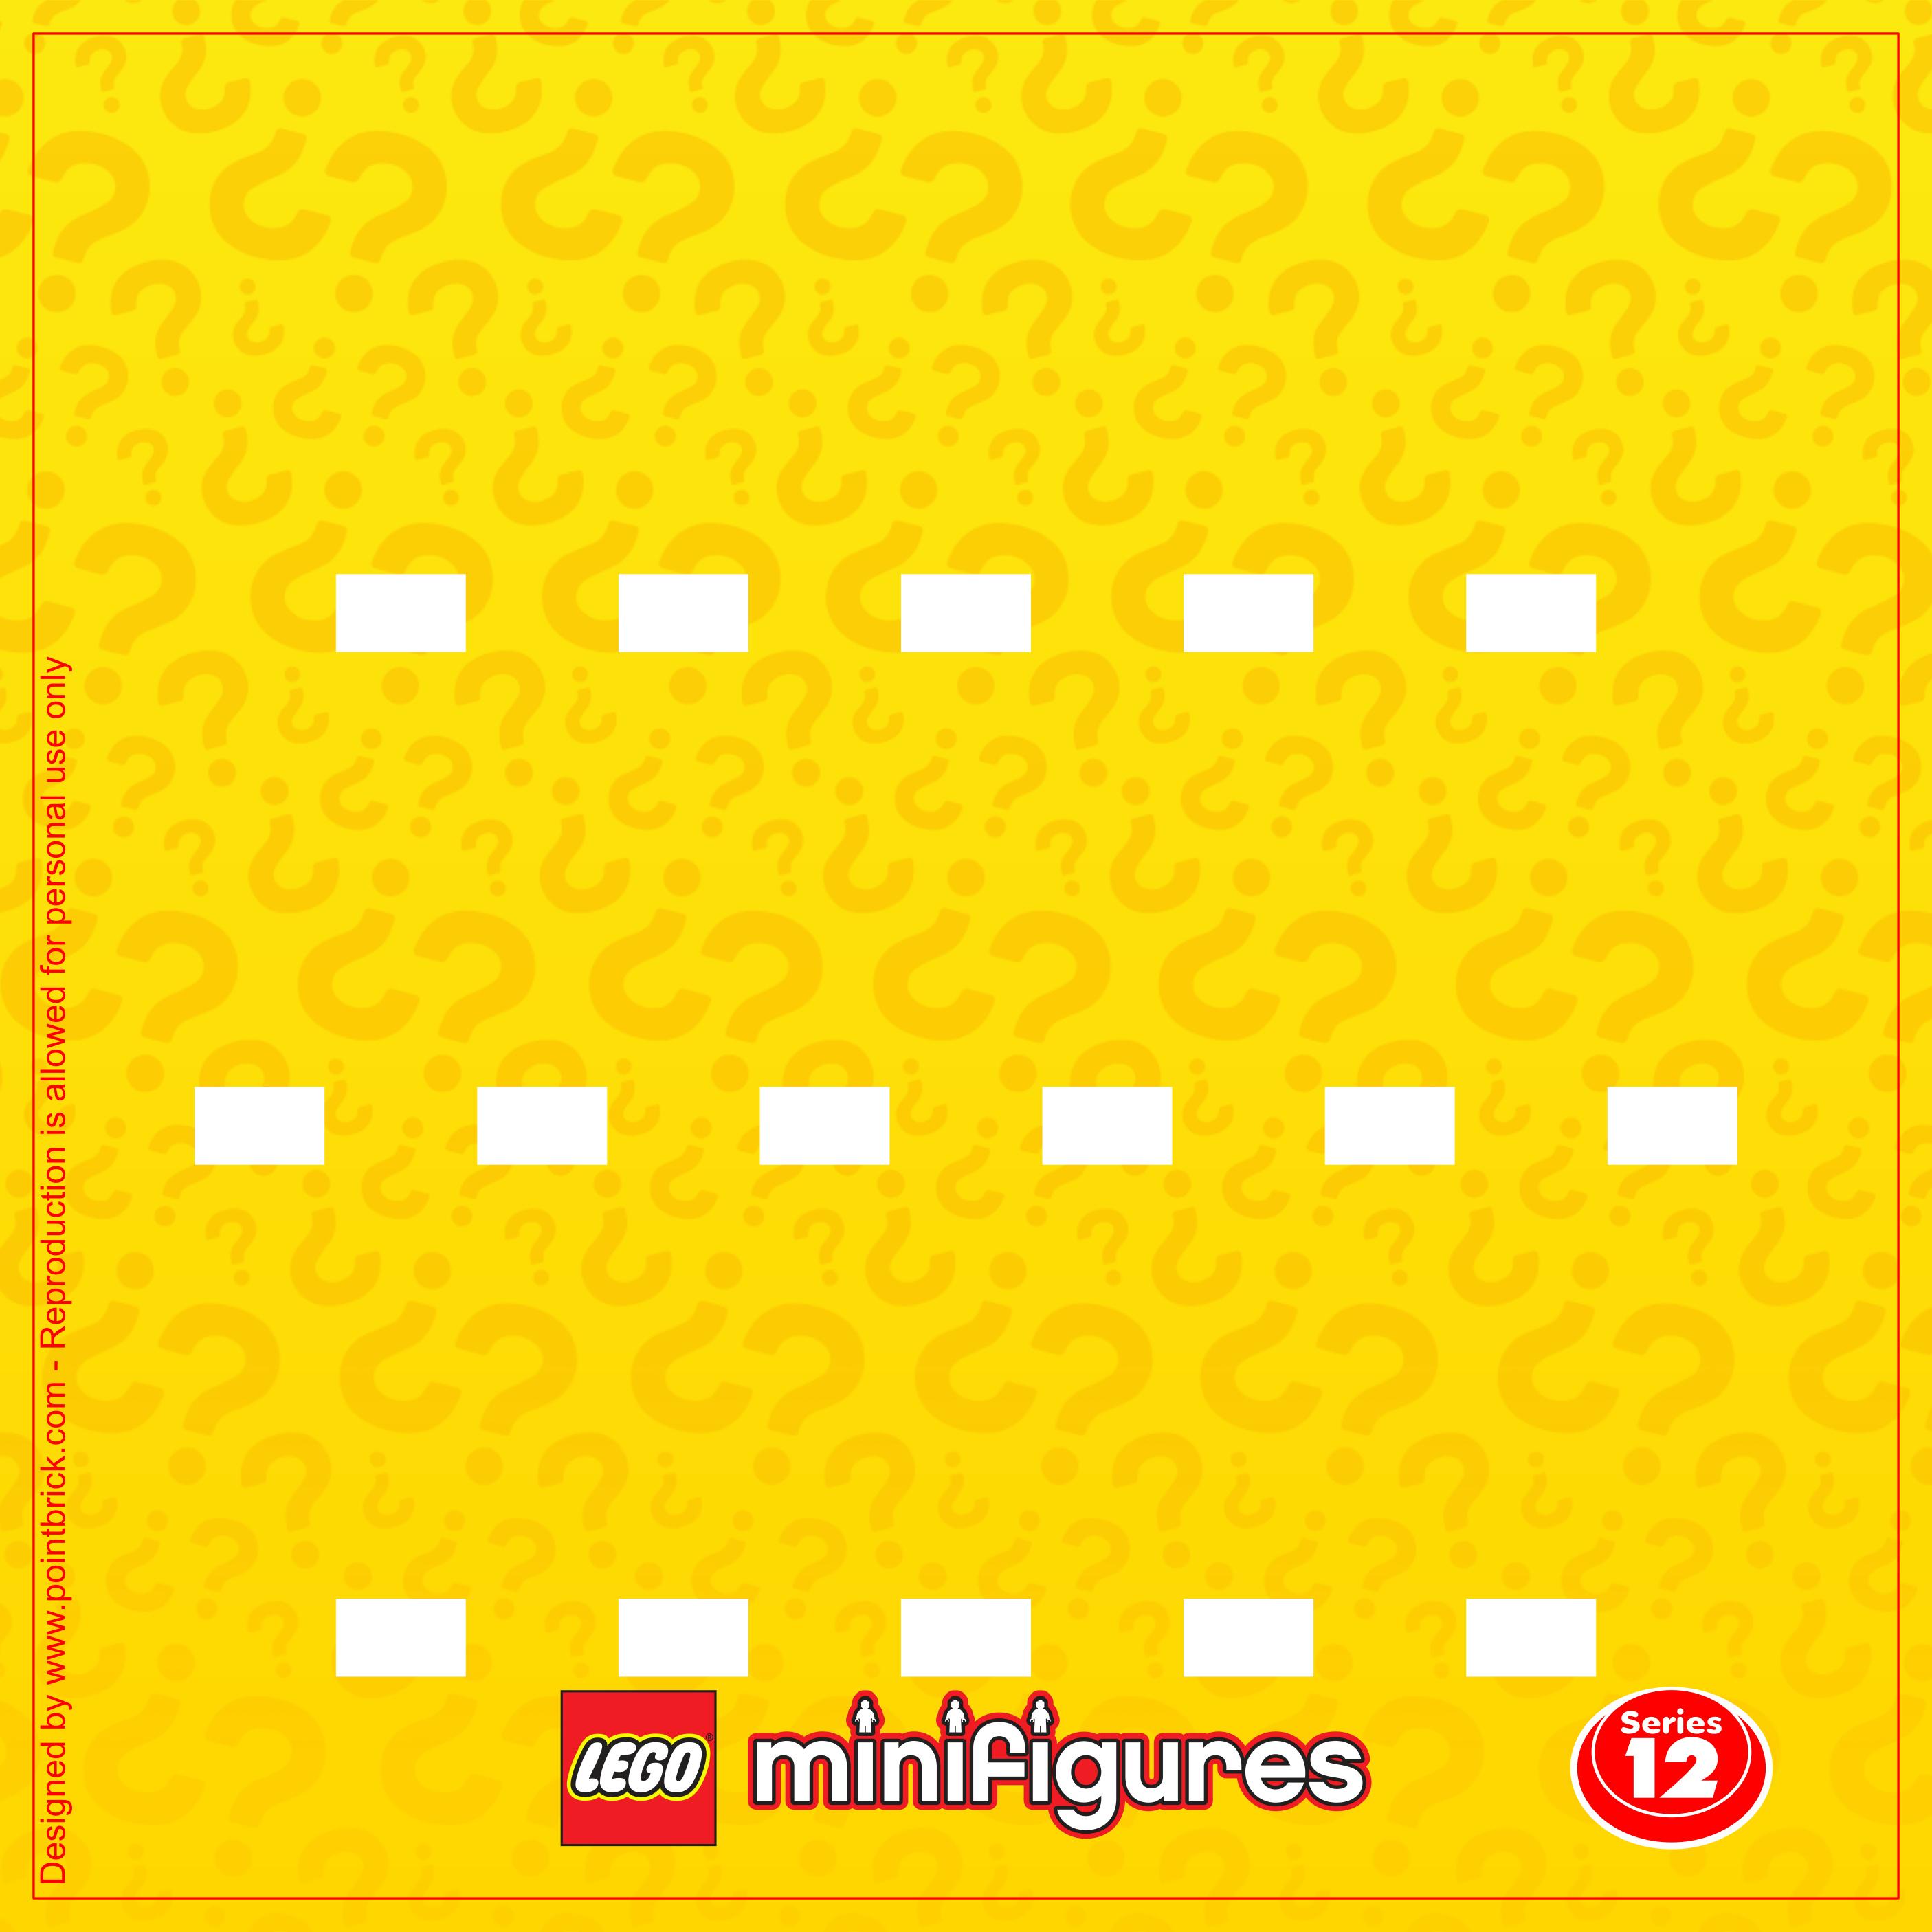 Point Brick Blog Lego Minifigures Display Sfondi Serie